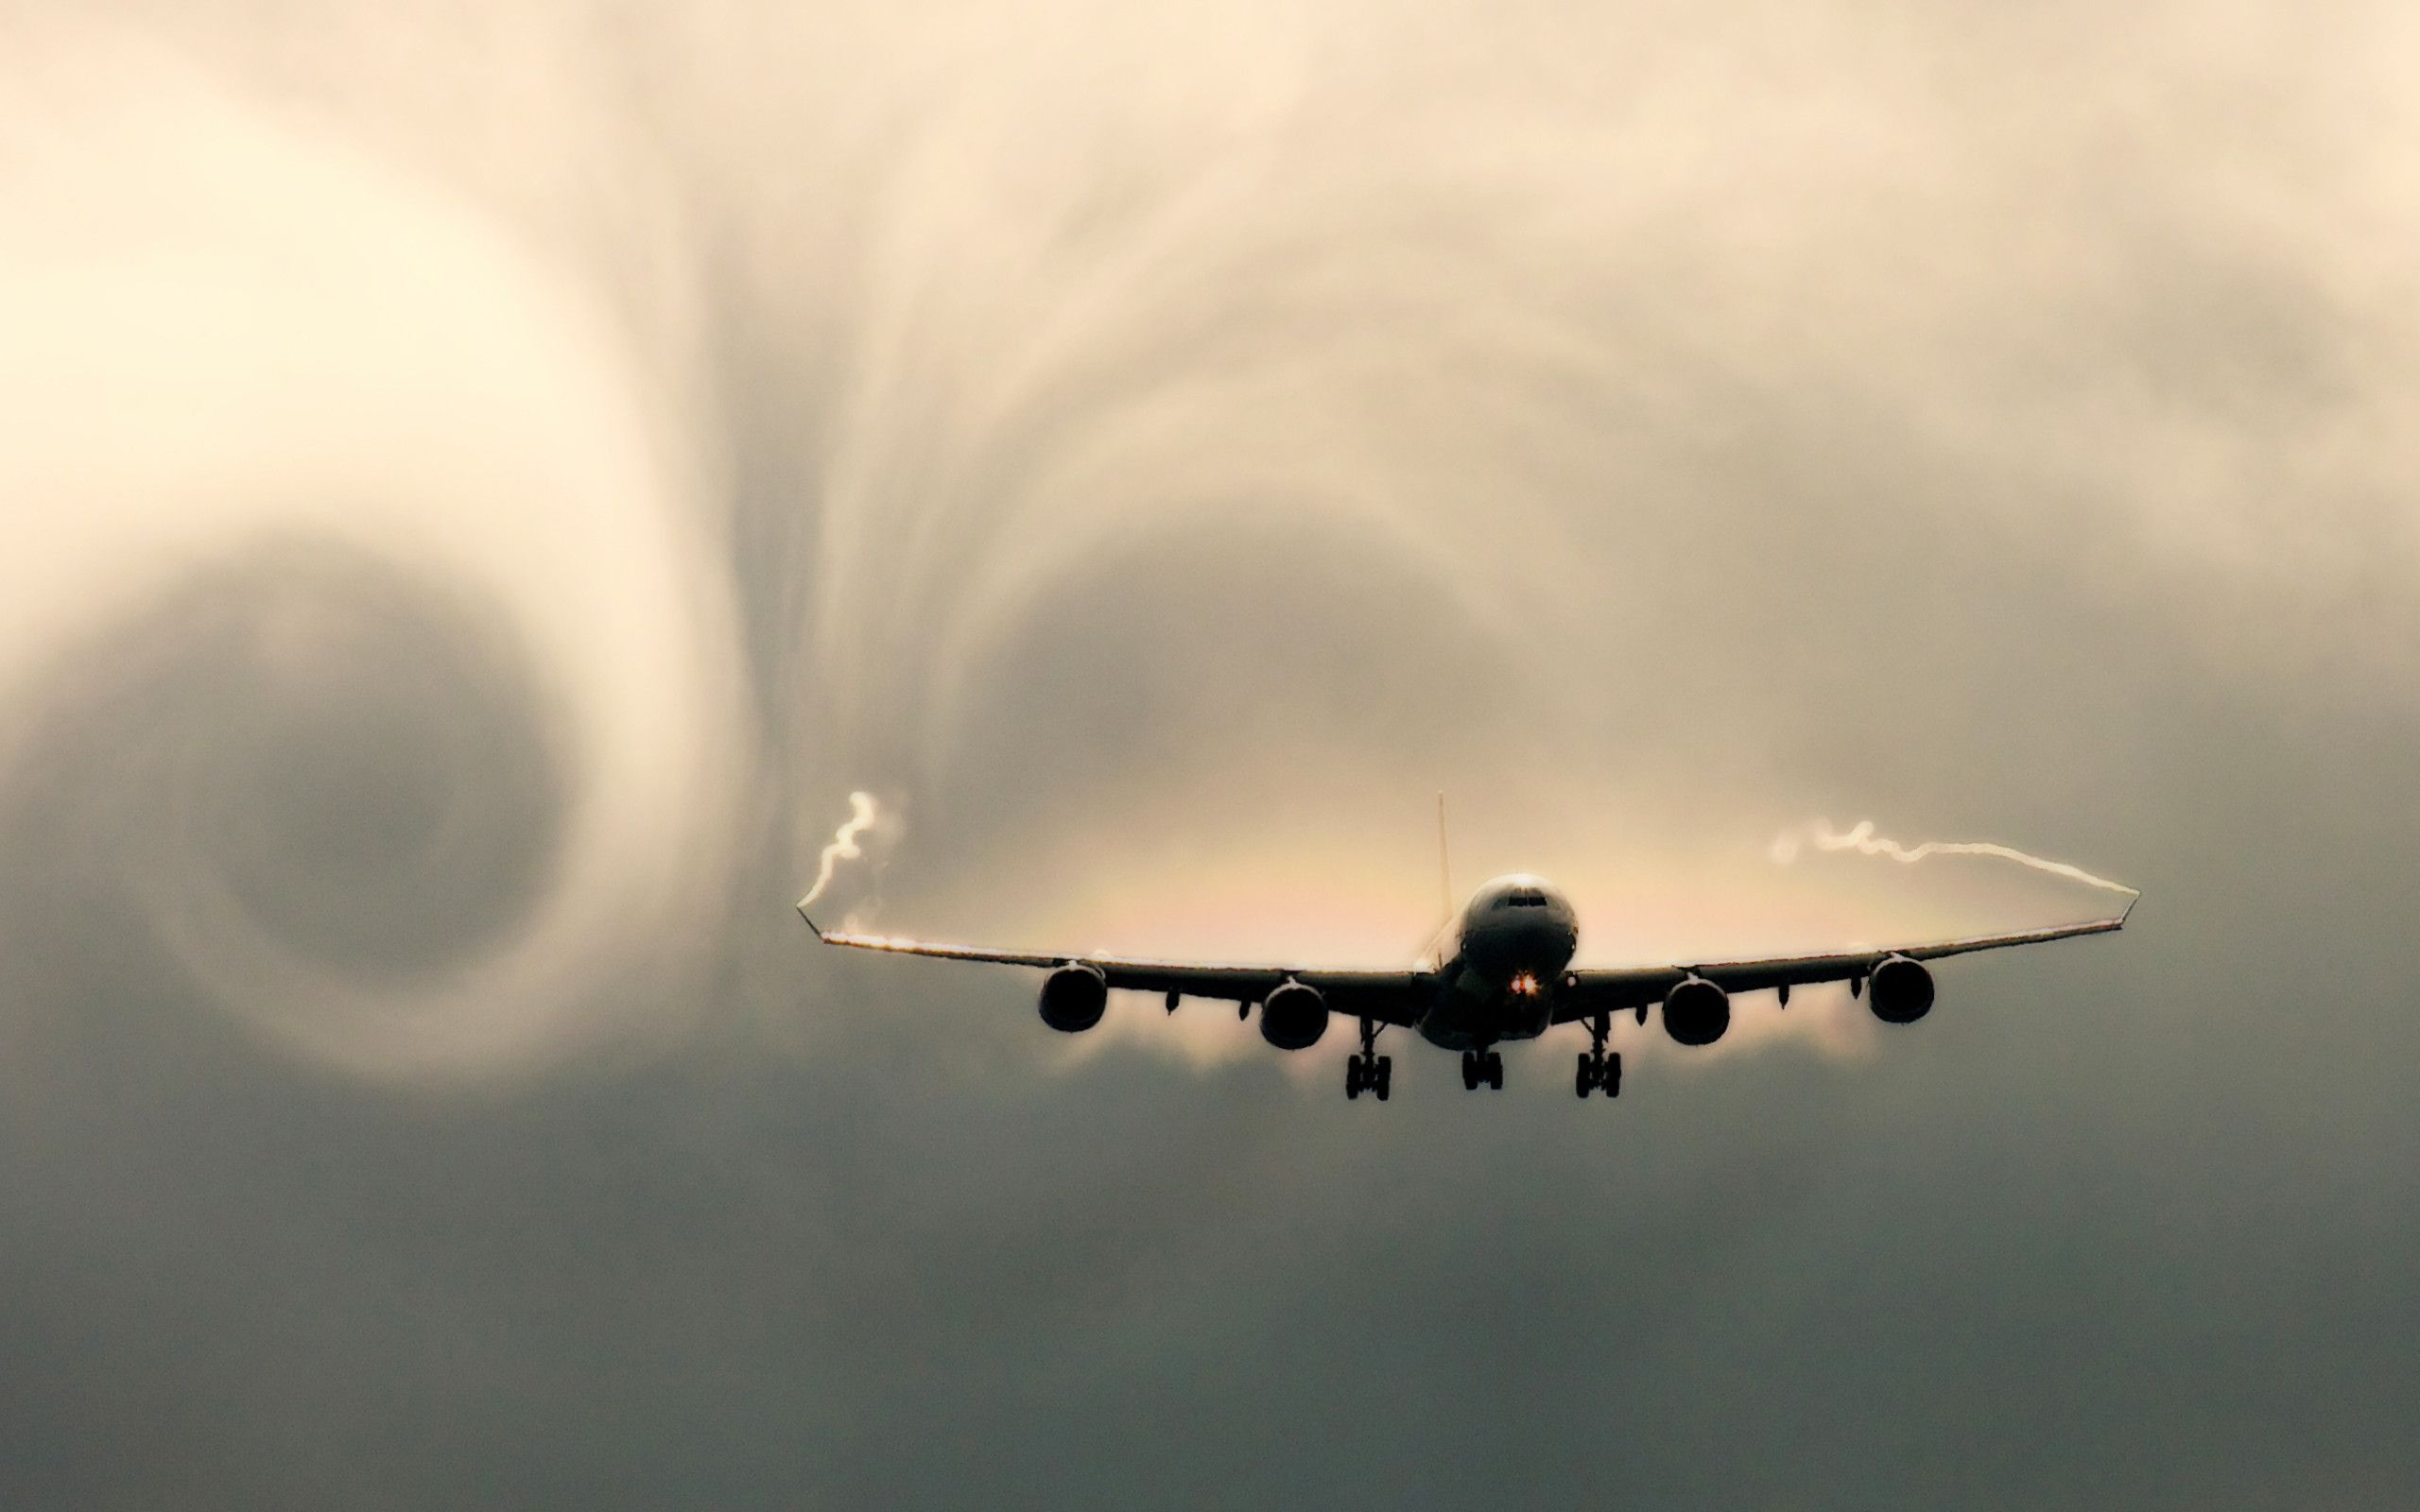 Aircraft Desktop Wallpapers Top Free Aircraft Desktop